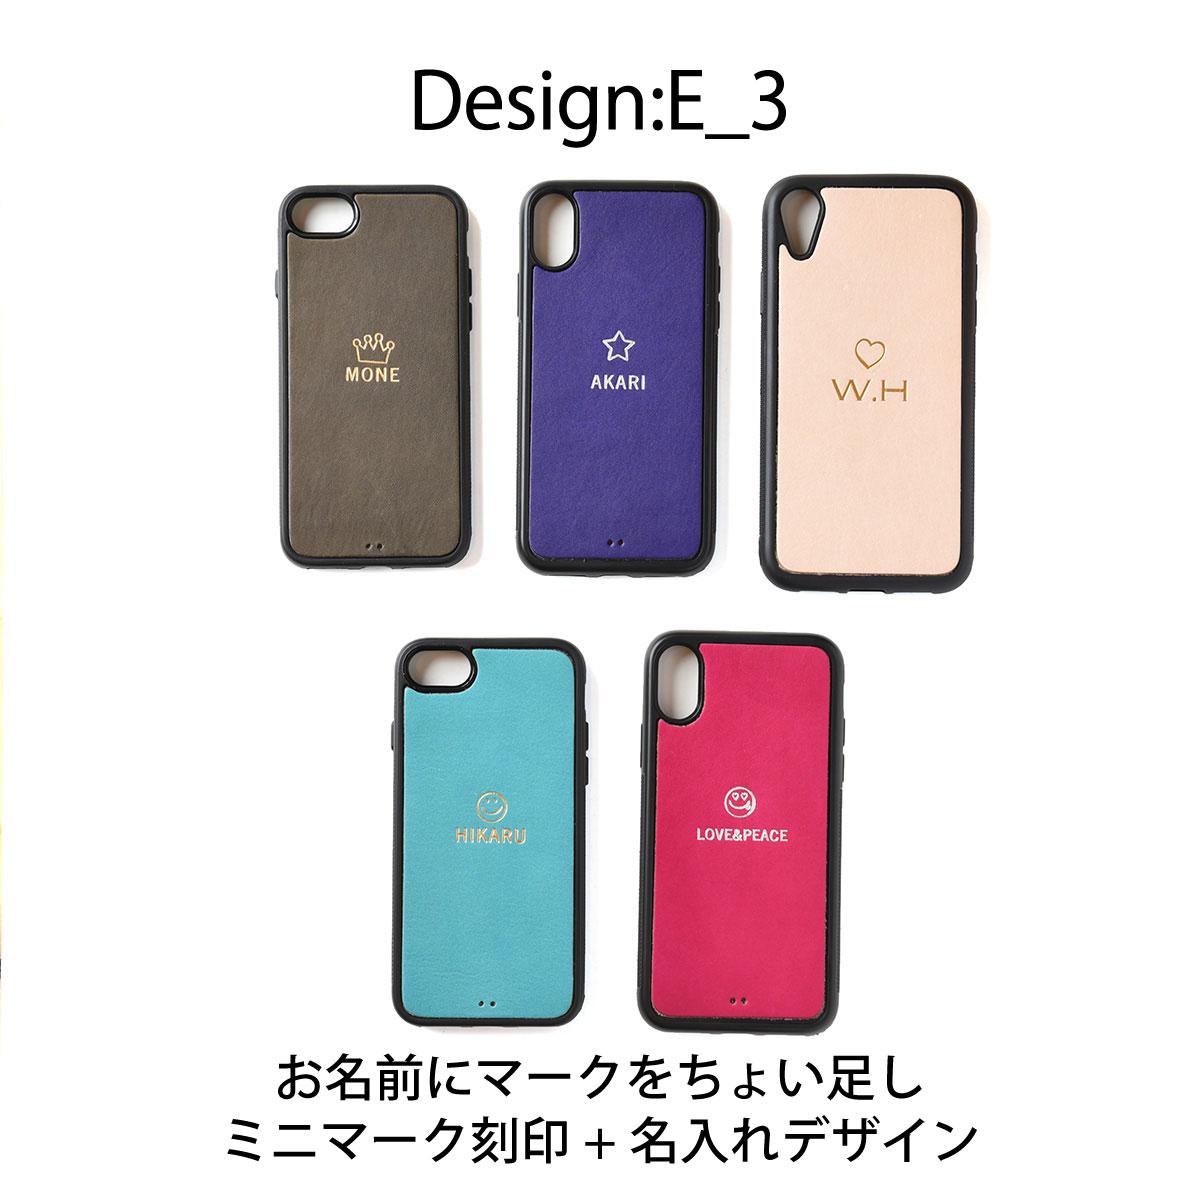 iPhoneOpenCase:   Design E_3:ミニマーク刻印(クラウン)+名入れ